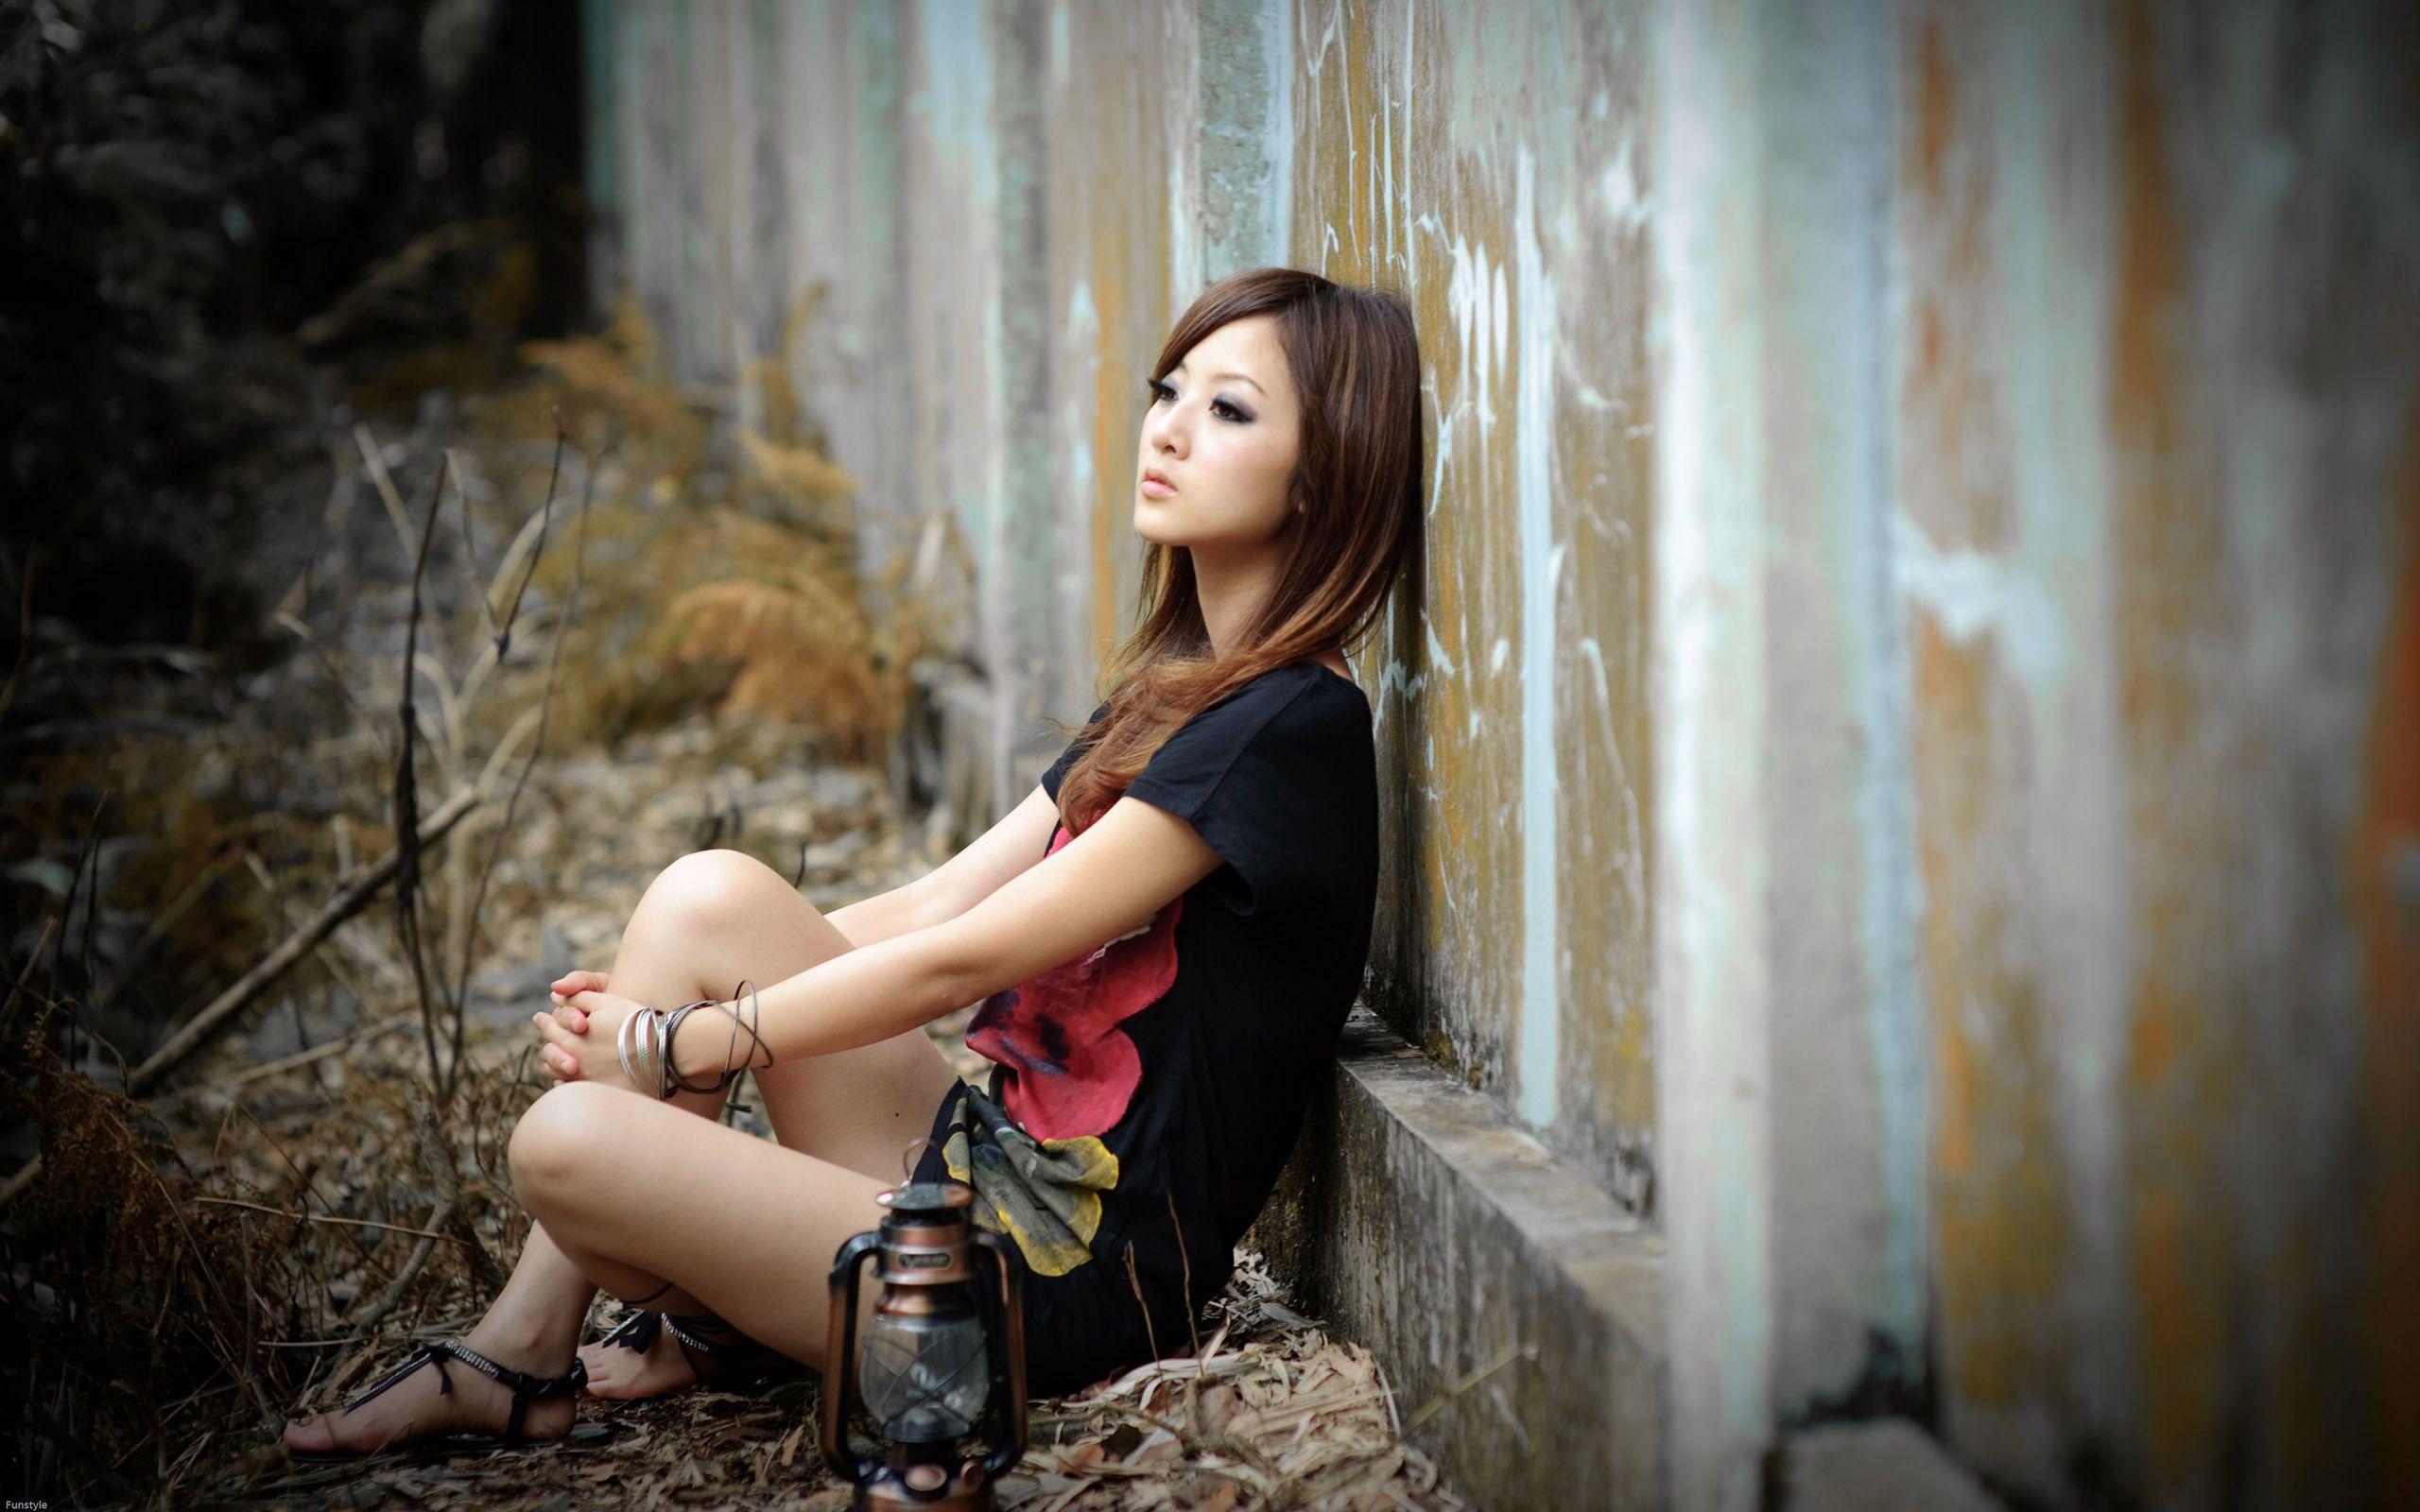 Alone Girls Wallpaper Hd Http Imashon Com W Alone Girls